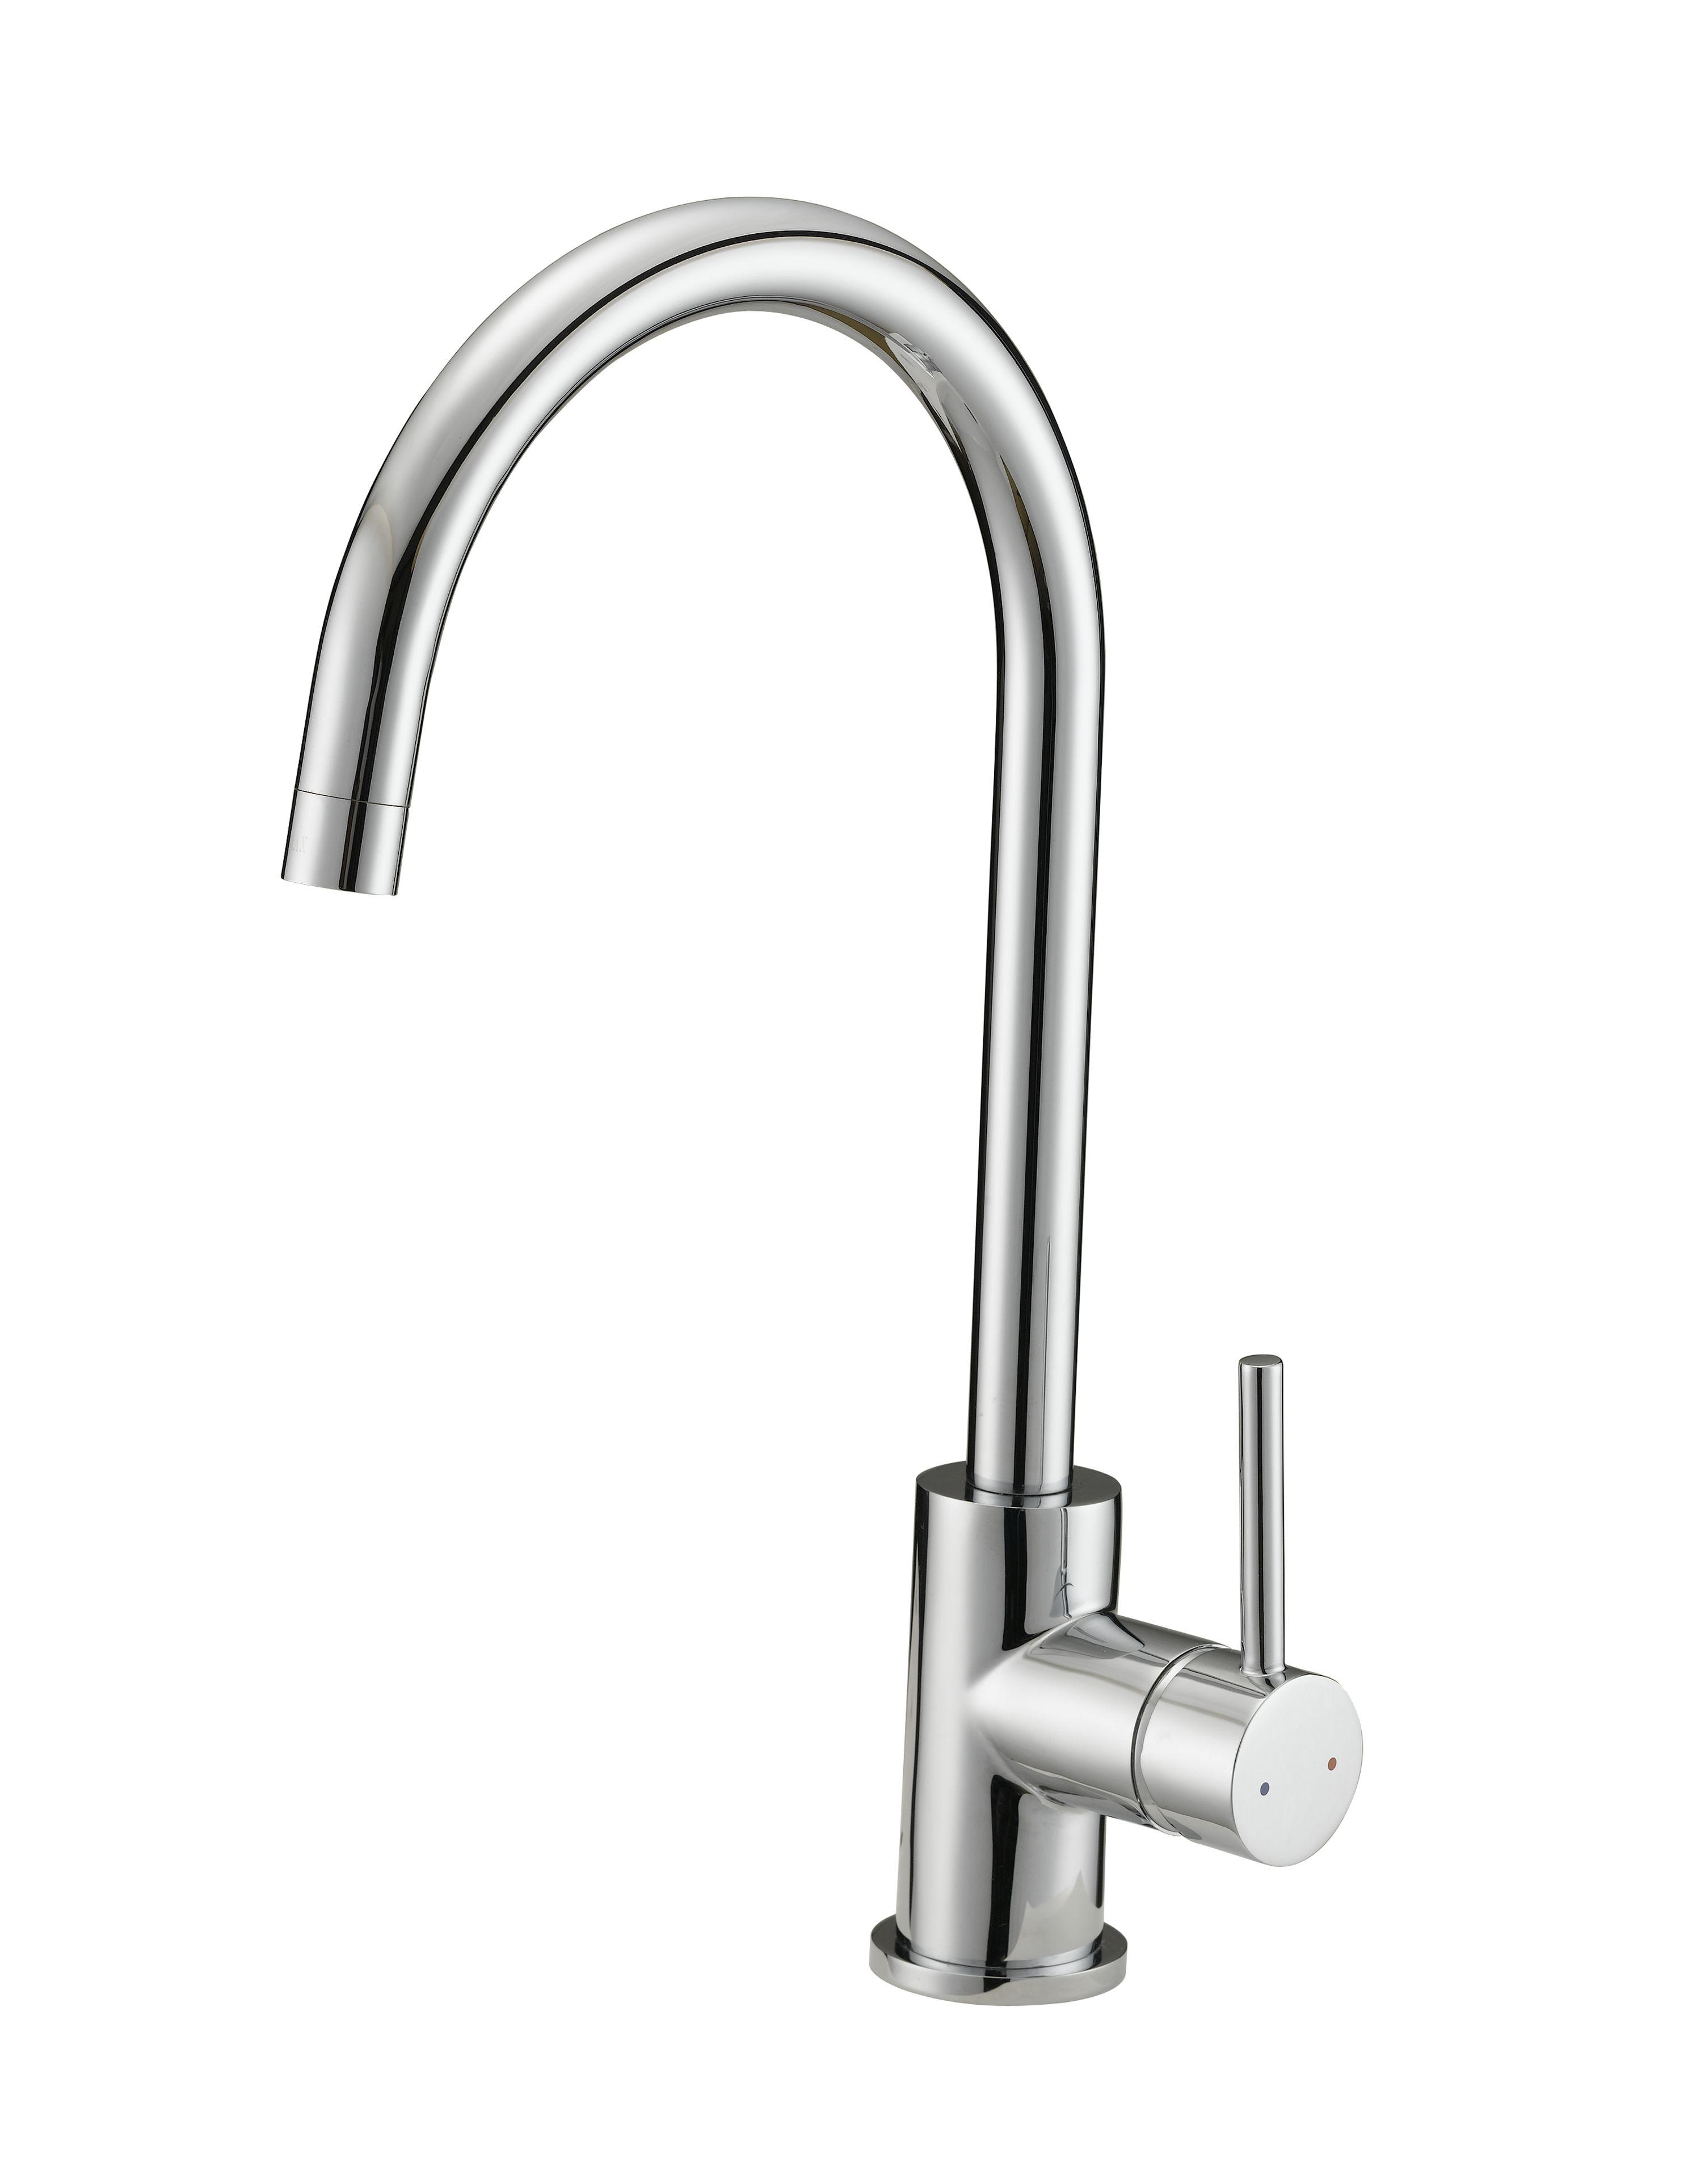 Design House Kitchen Faucets Only 17076 Design House 547695 Eastport Single Handle Kitchen